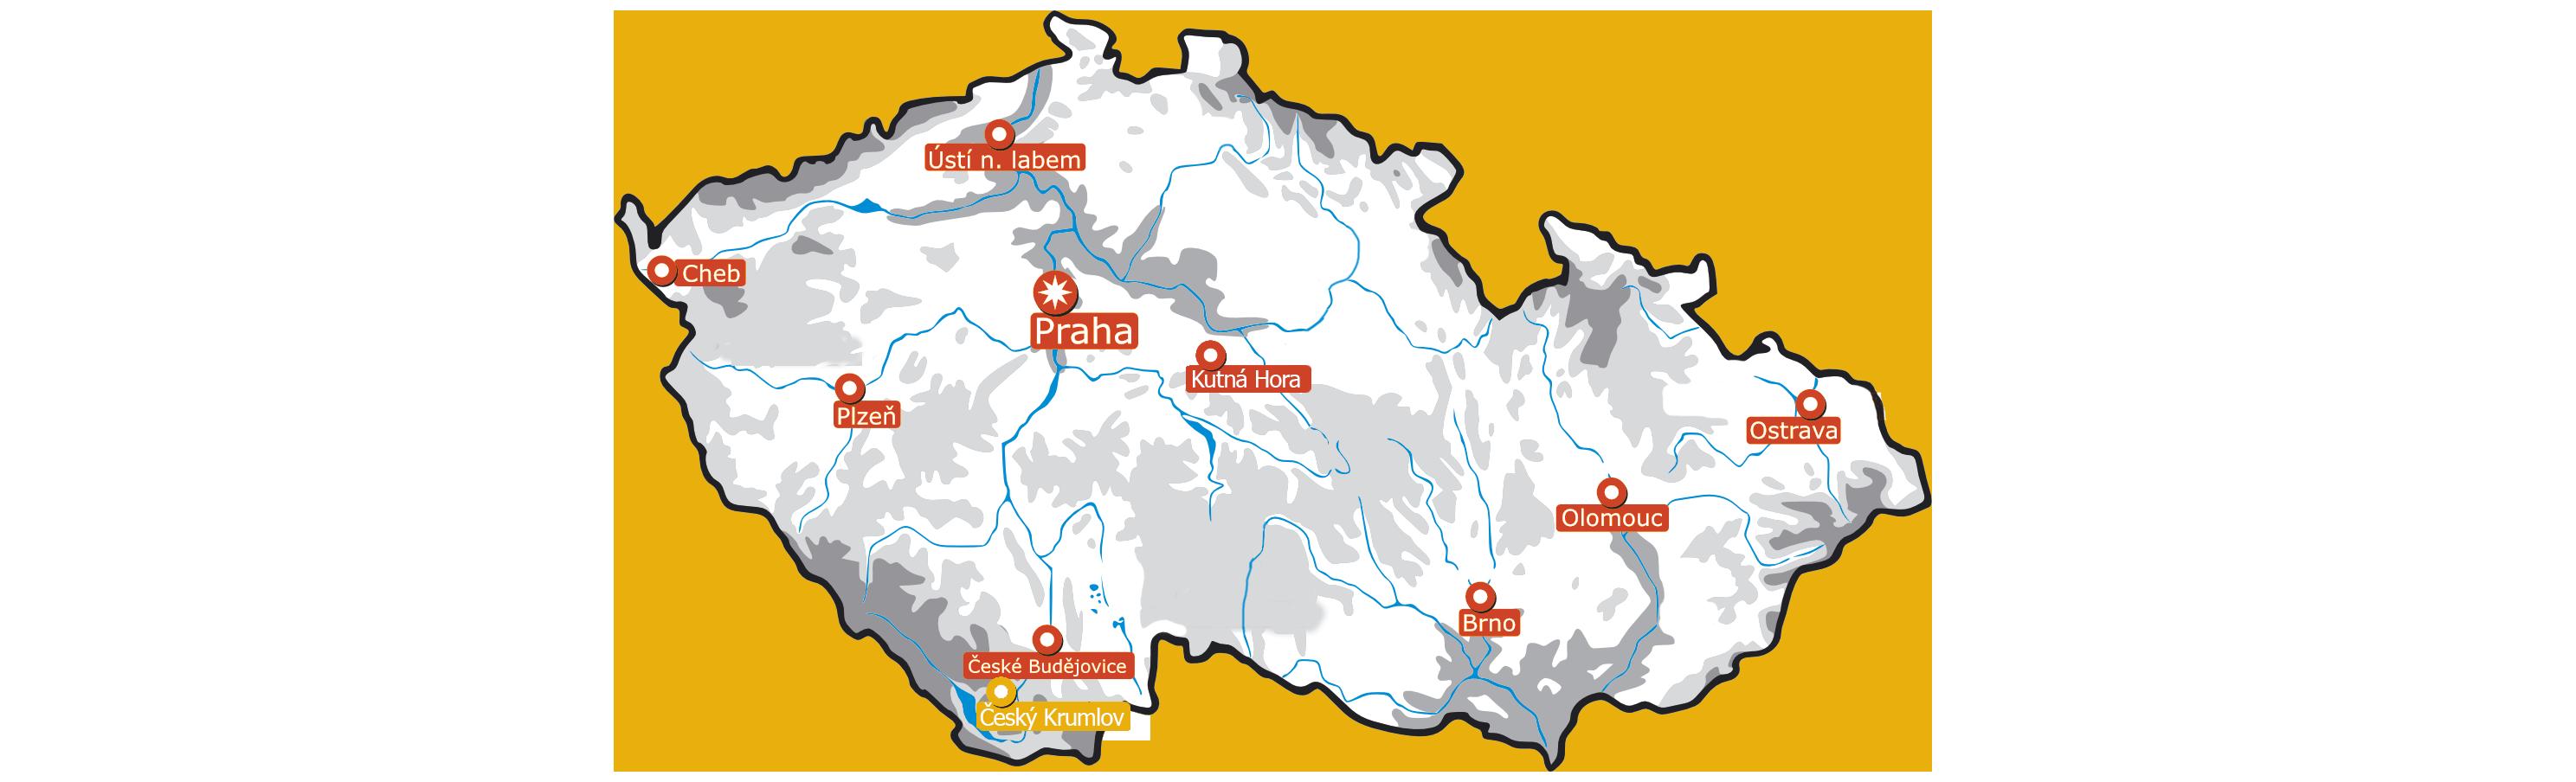 SCNAC mapa_ceske_republiky bez mest